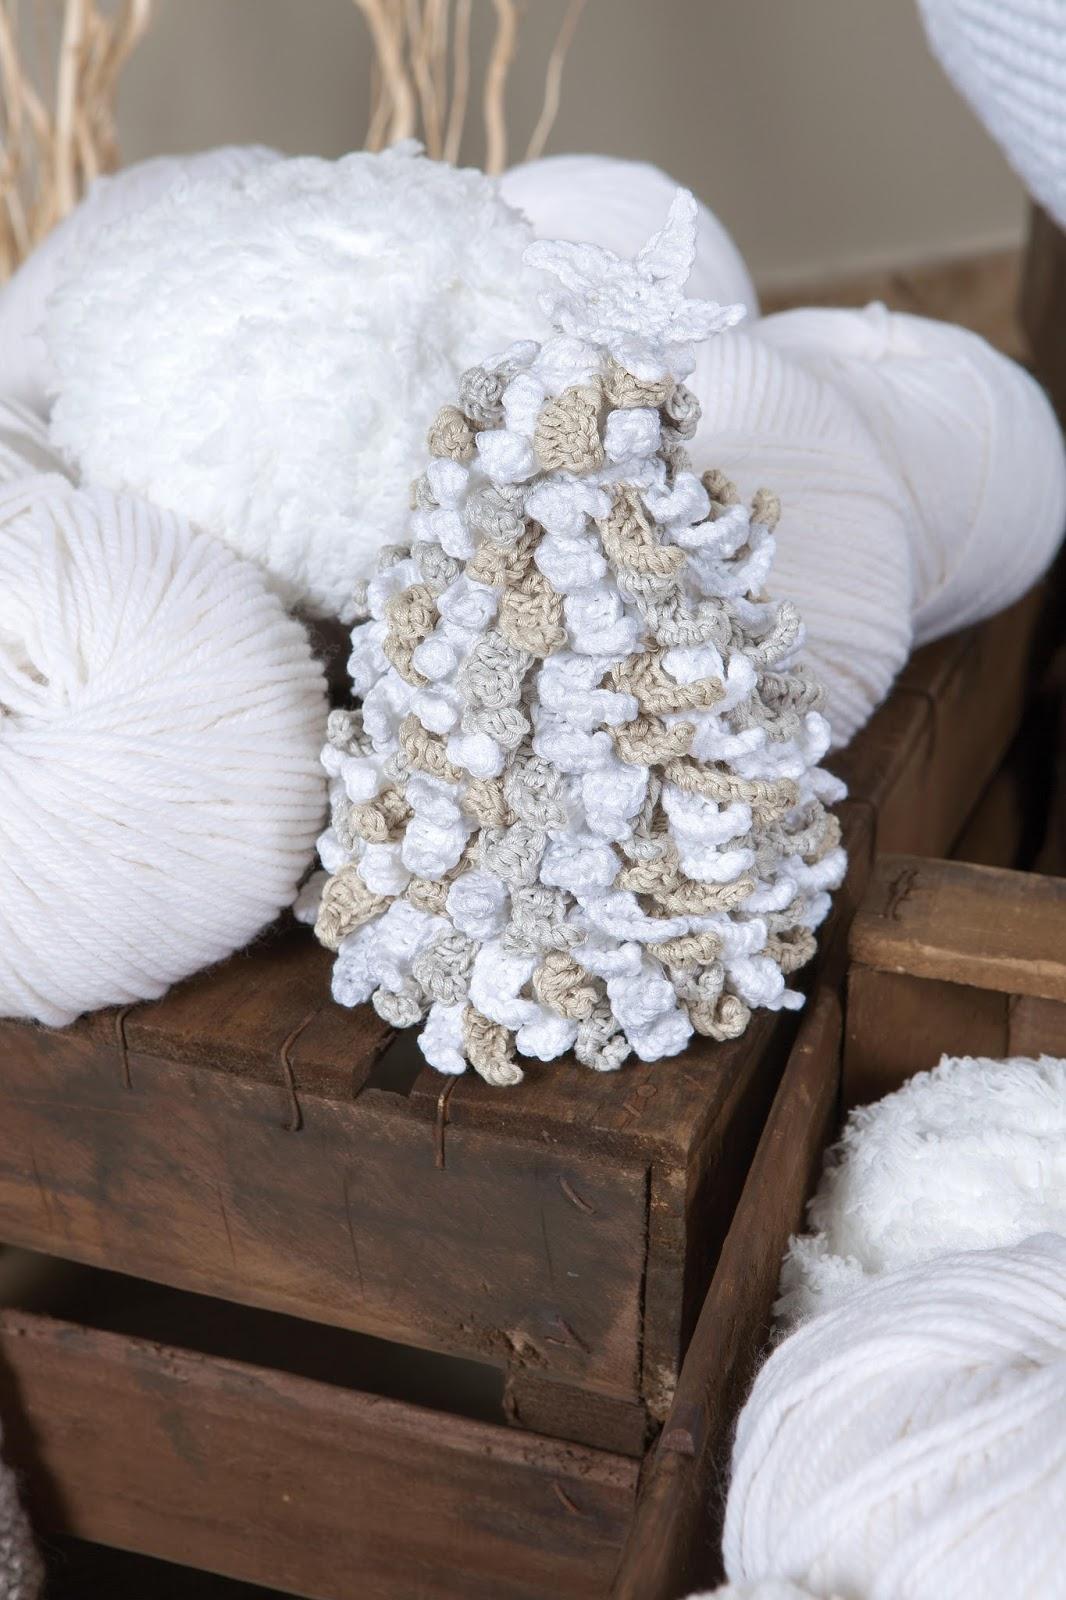 ouvrages can 39 elle tricoter crocheter votre deco de noel. Black Bedroom Furniture Sets. Home Design Ideas